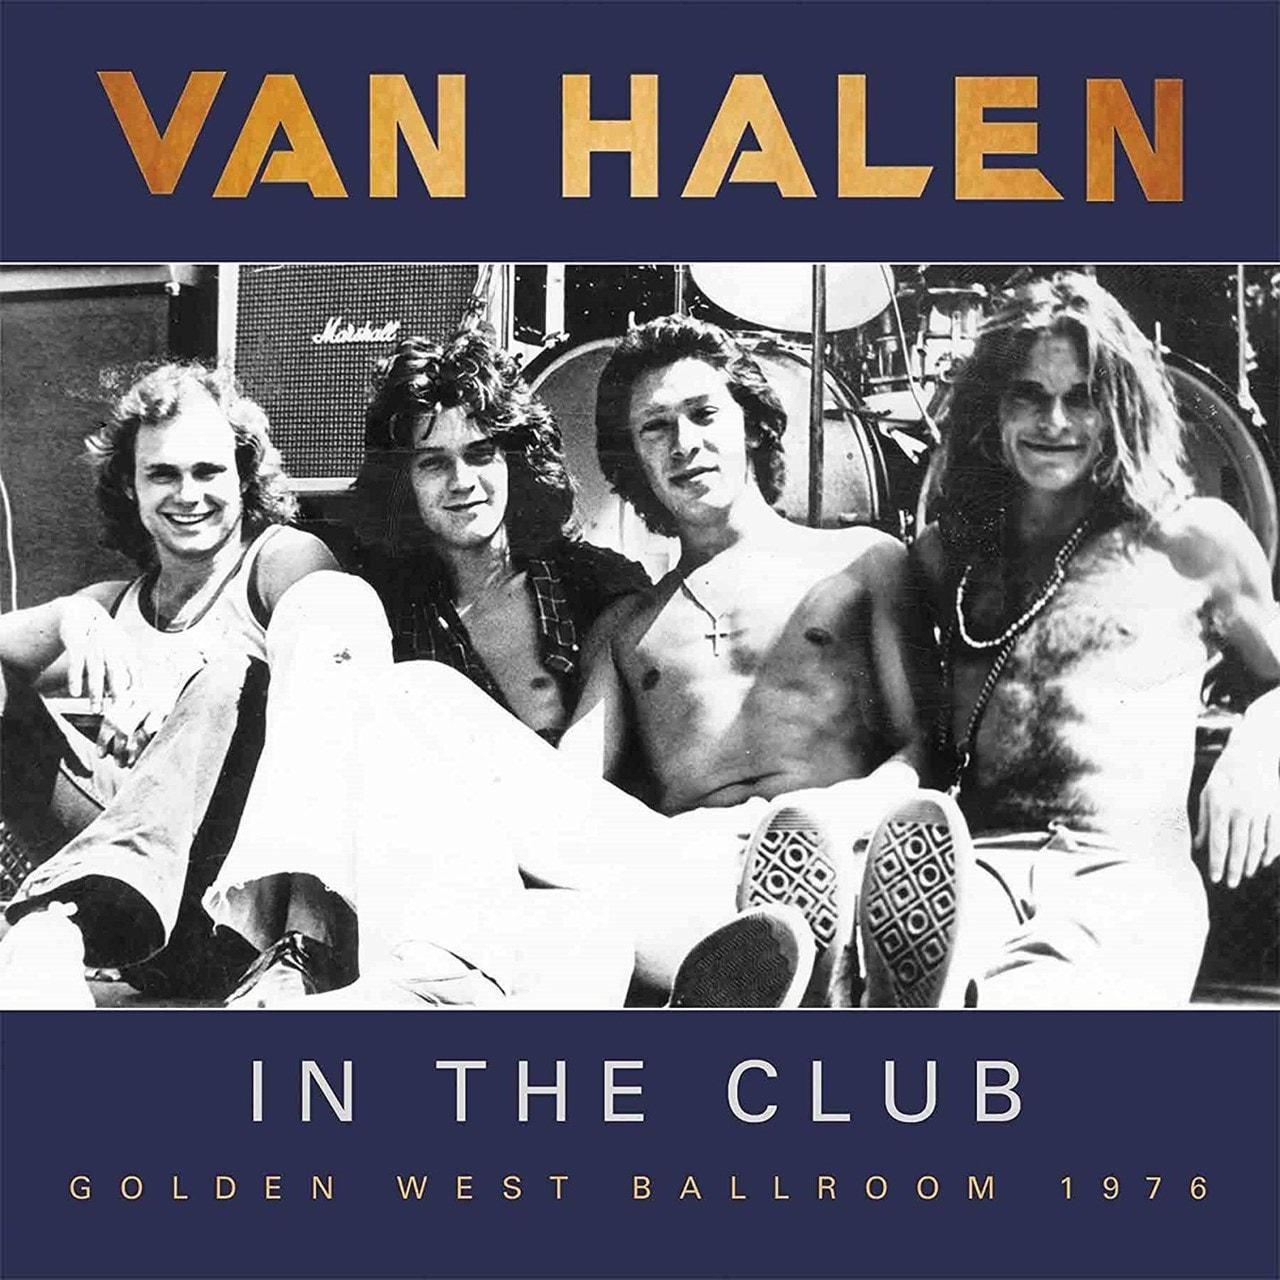 In the Club: Golden West Ballroom 1976 - 1